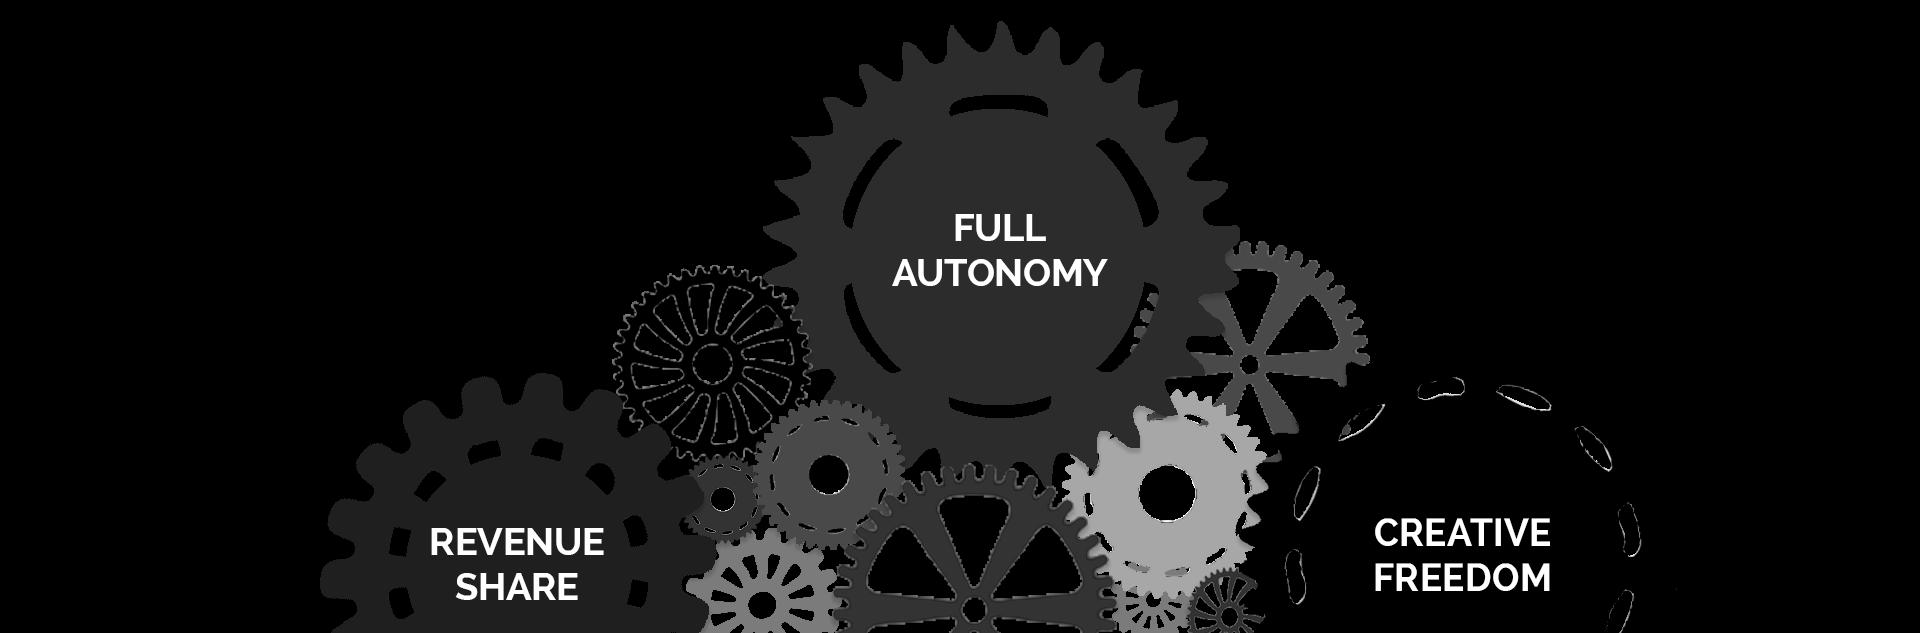 Carbon Incubator - Revenue Share, Full Autonomy, Creative Freedom